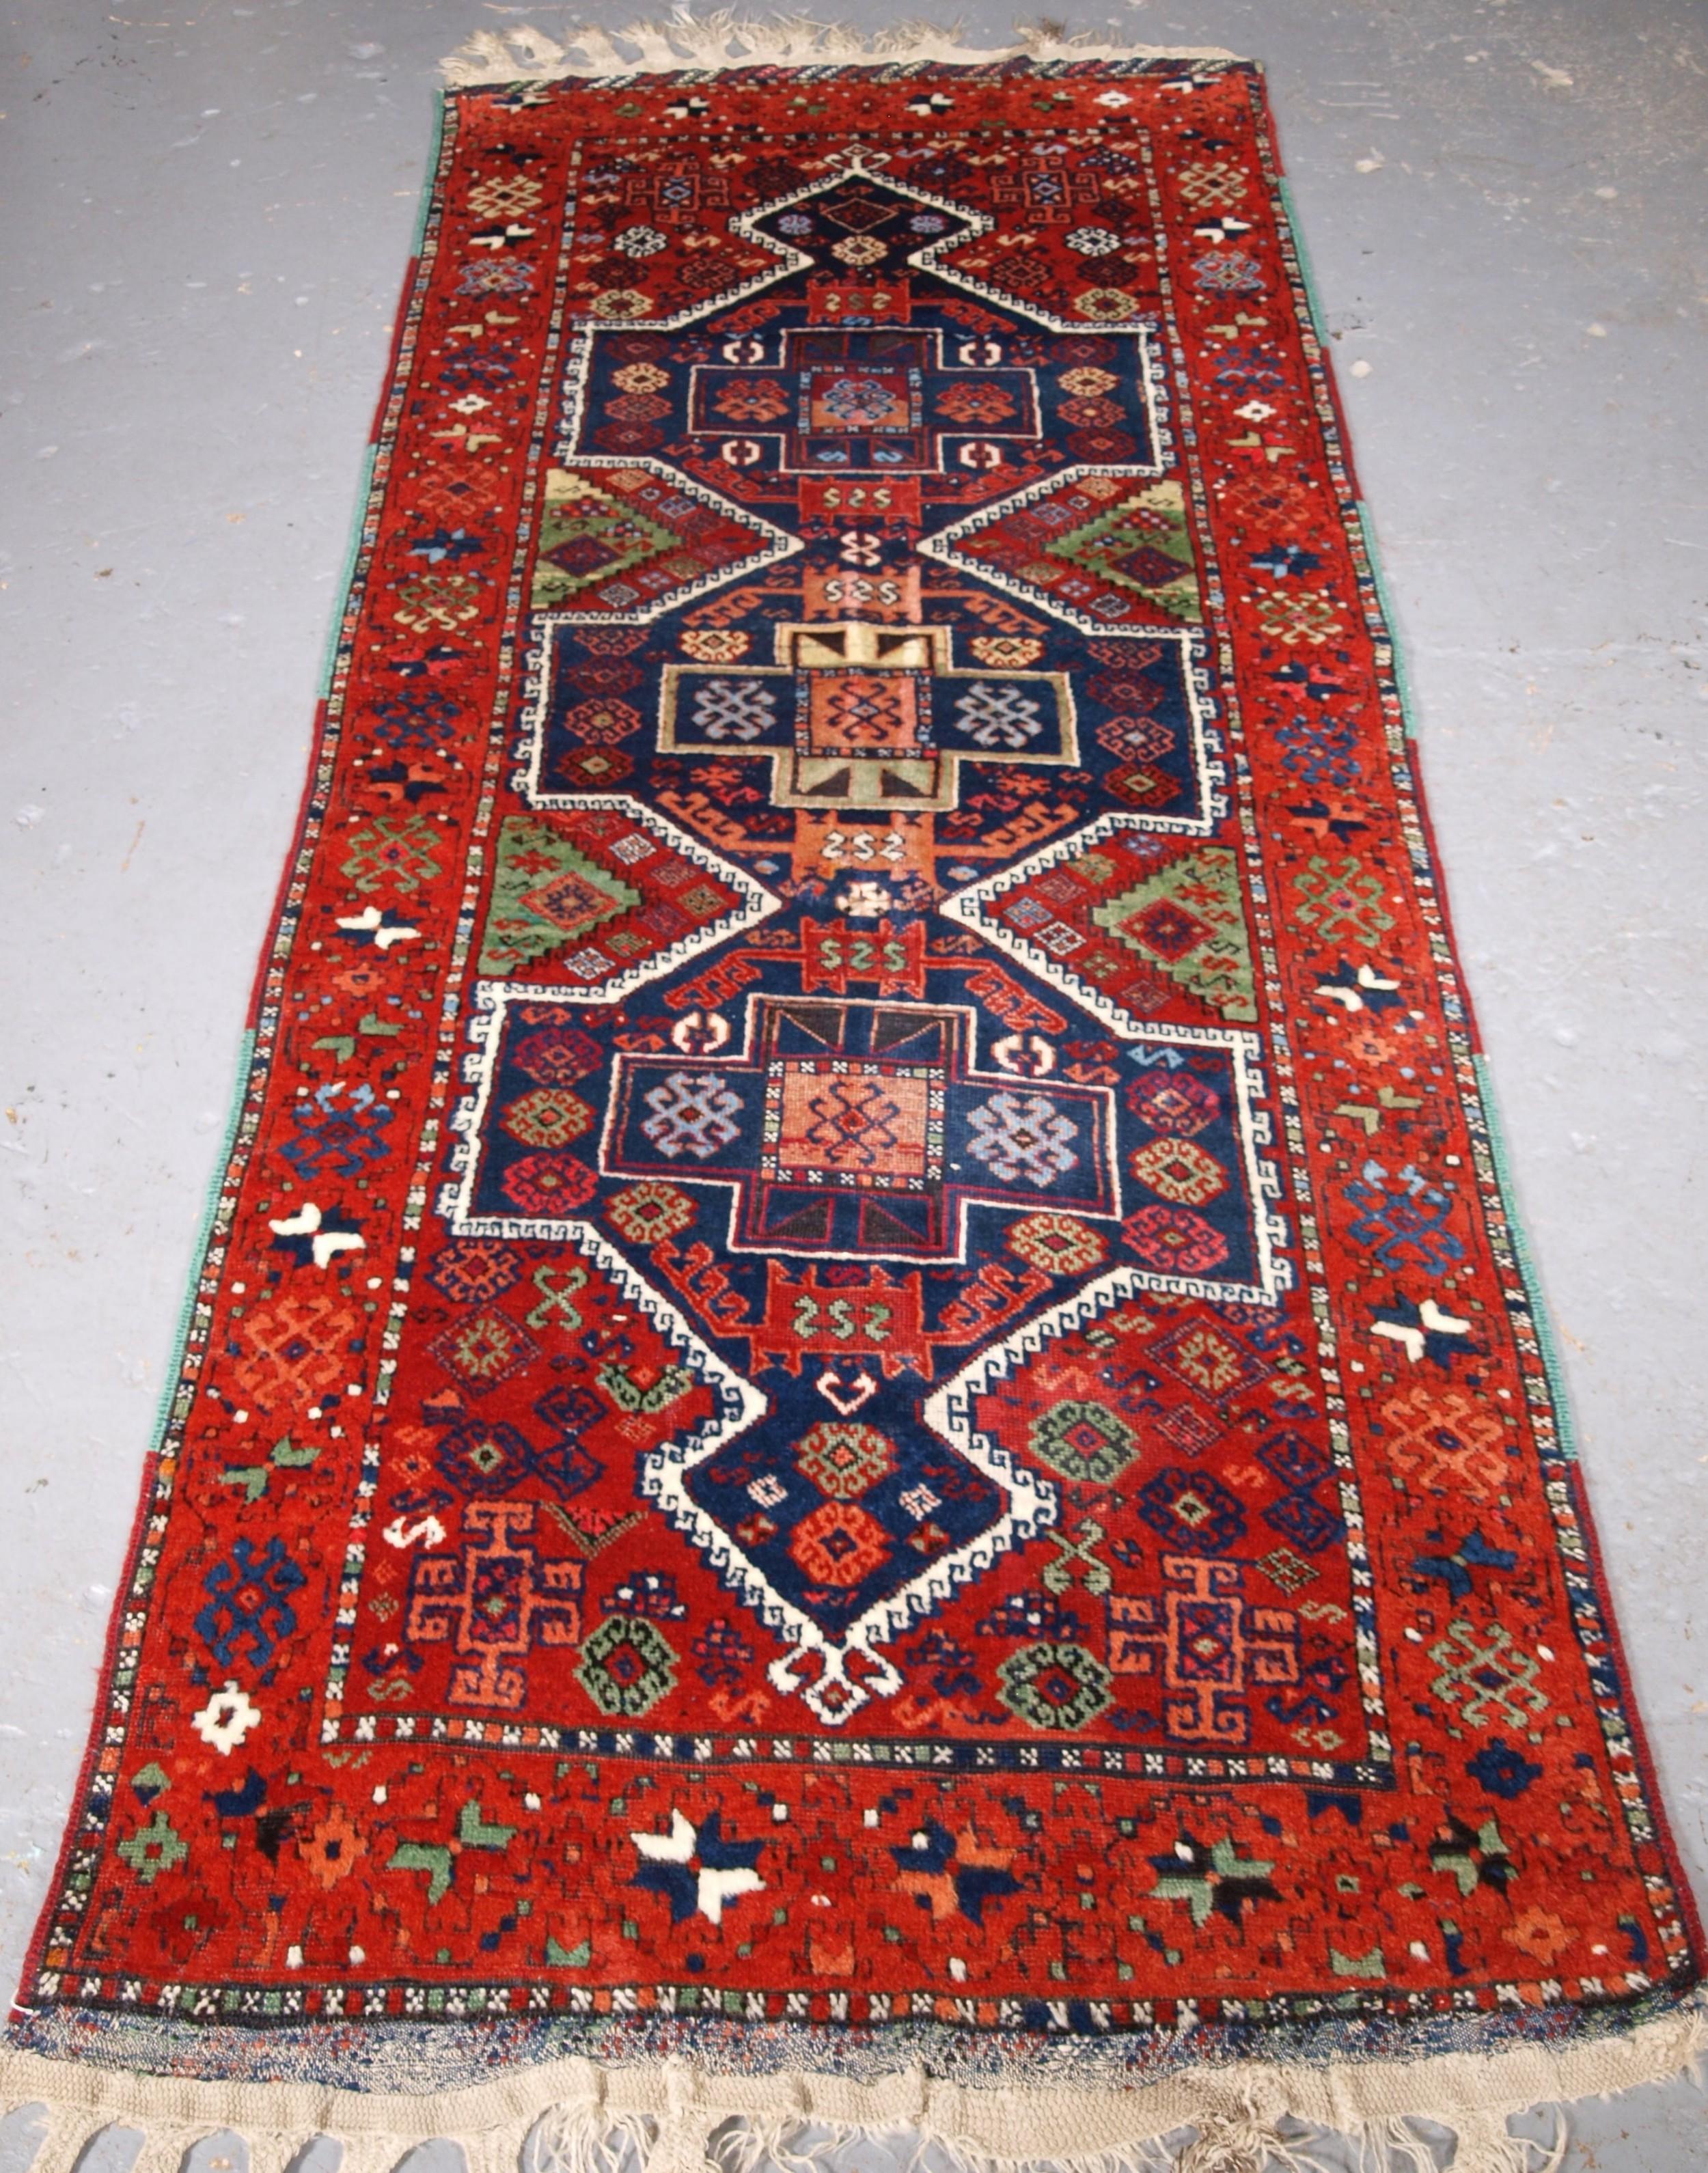 antique turkish yuruk long rug threemedallion design circa 1900